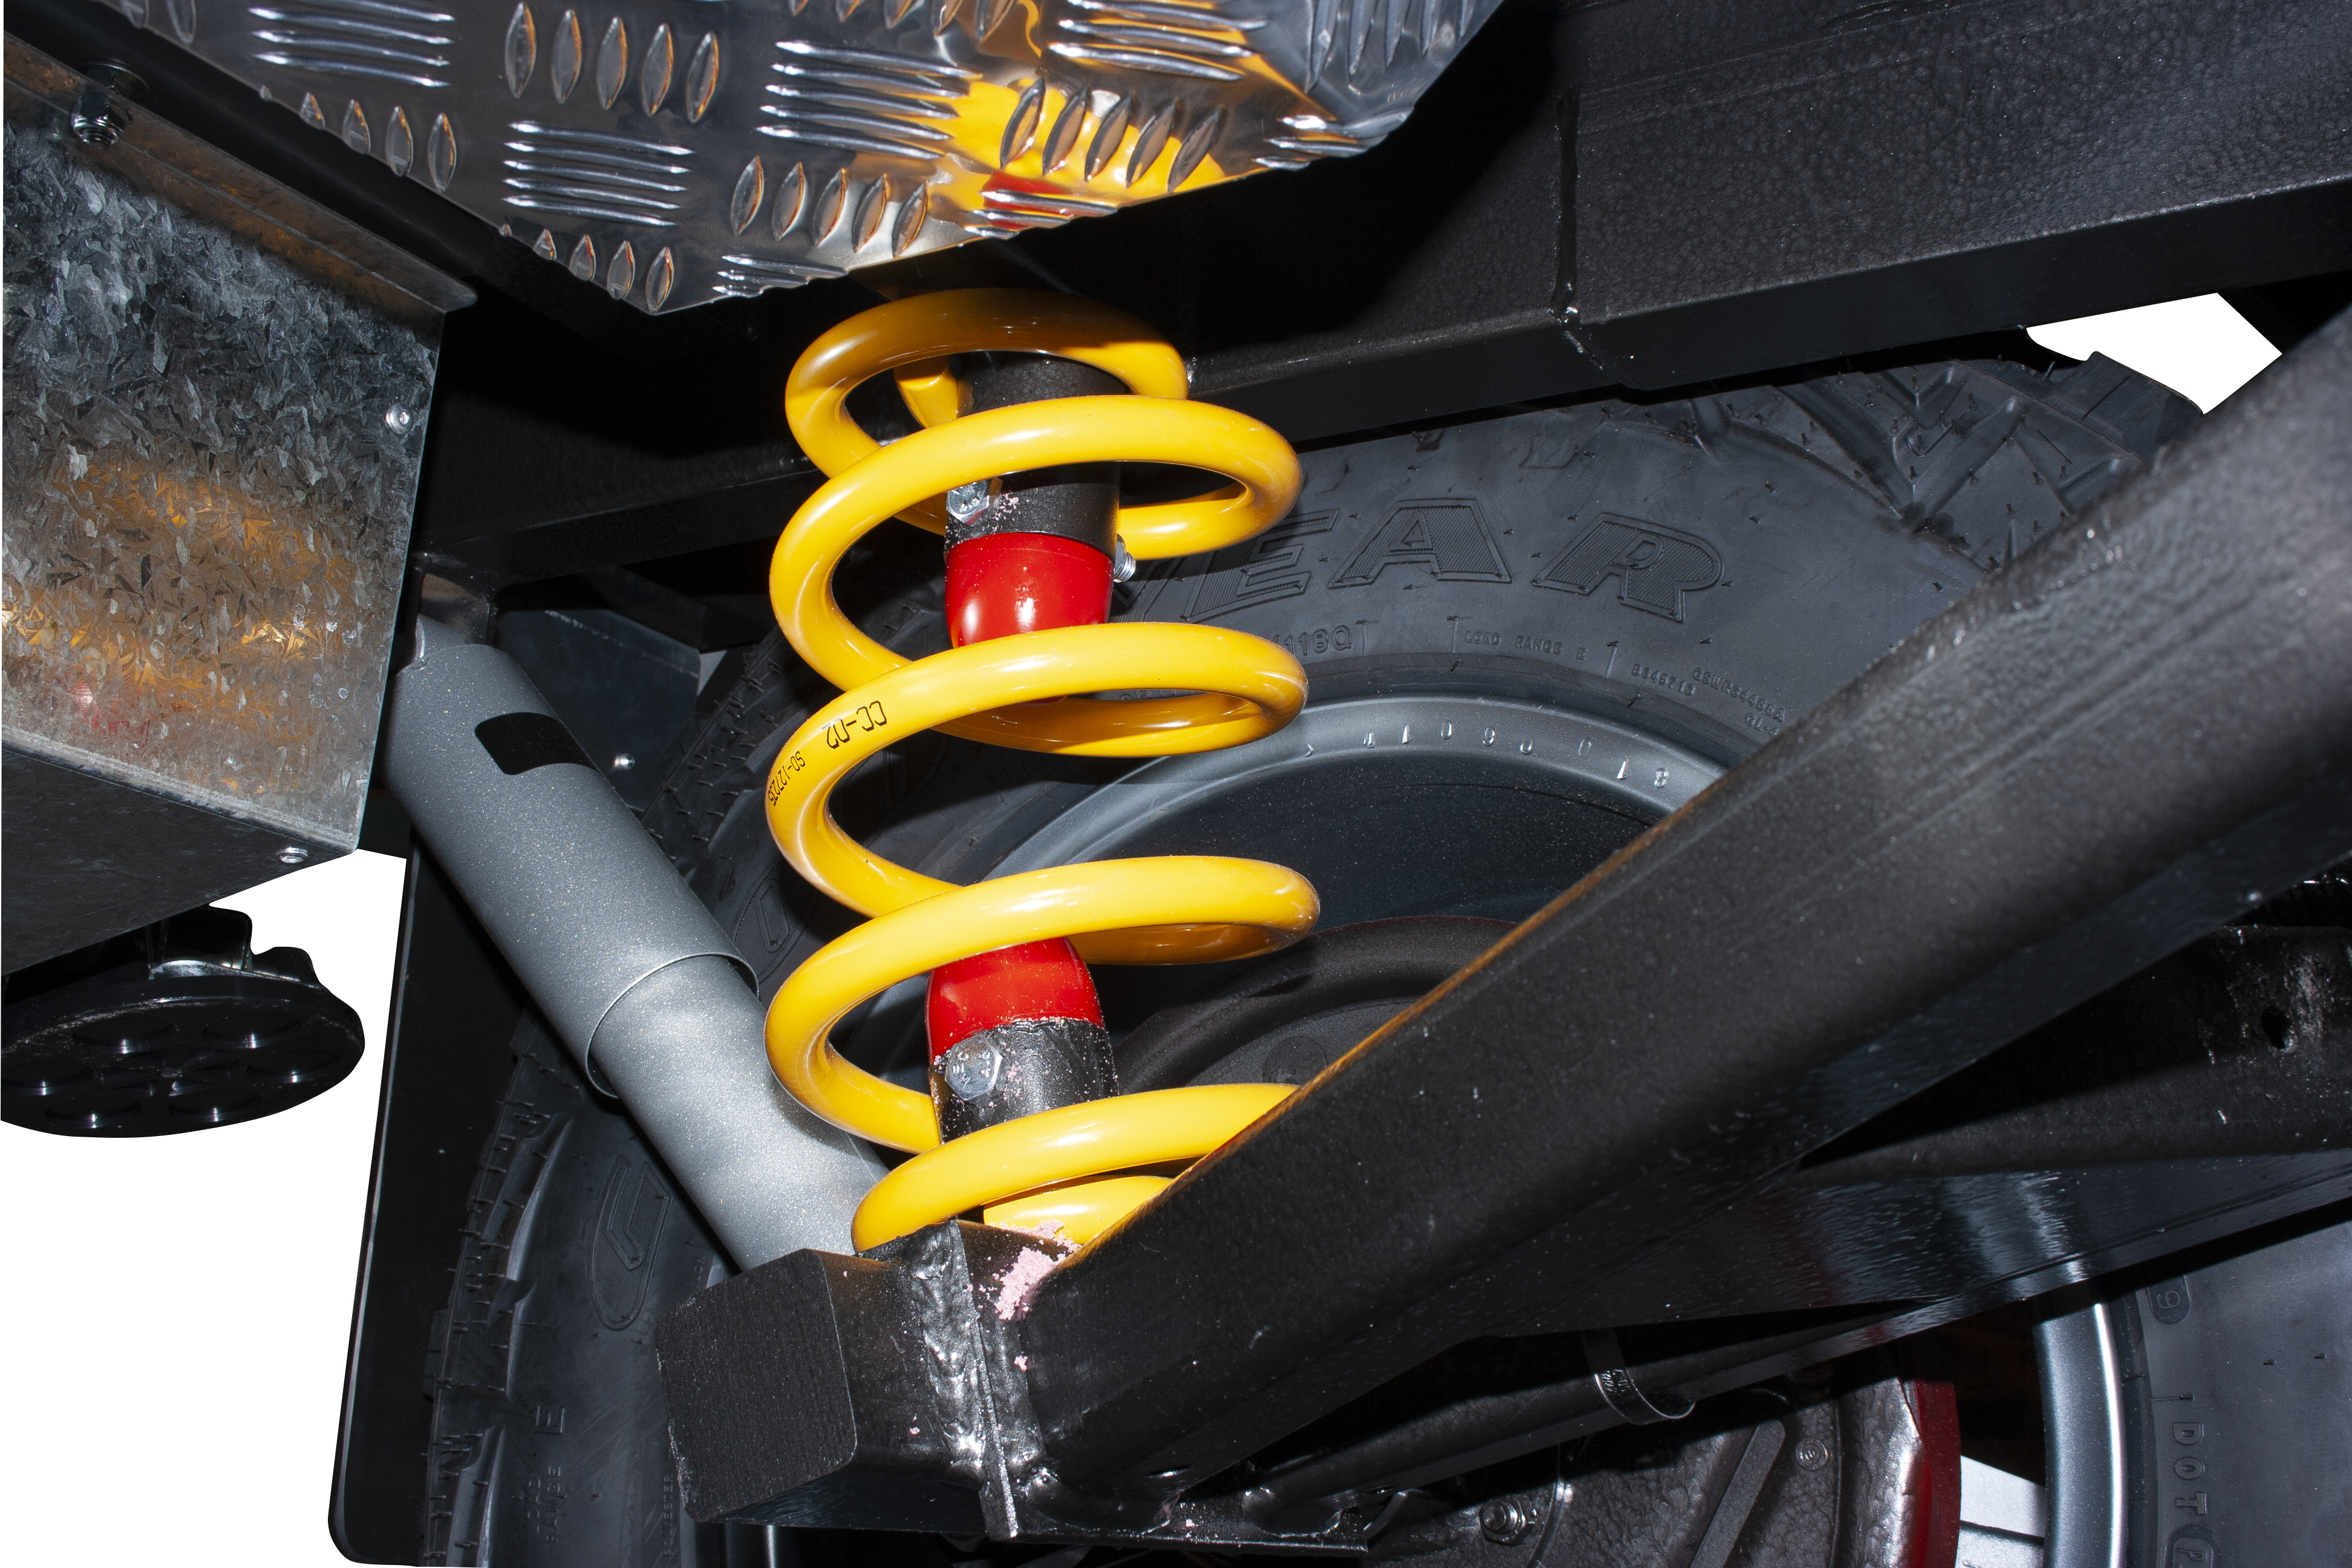 heavyduty coil-spring suspension